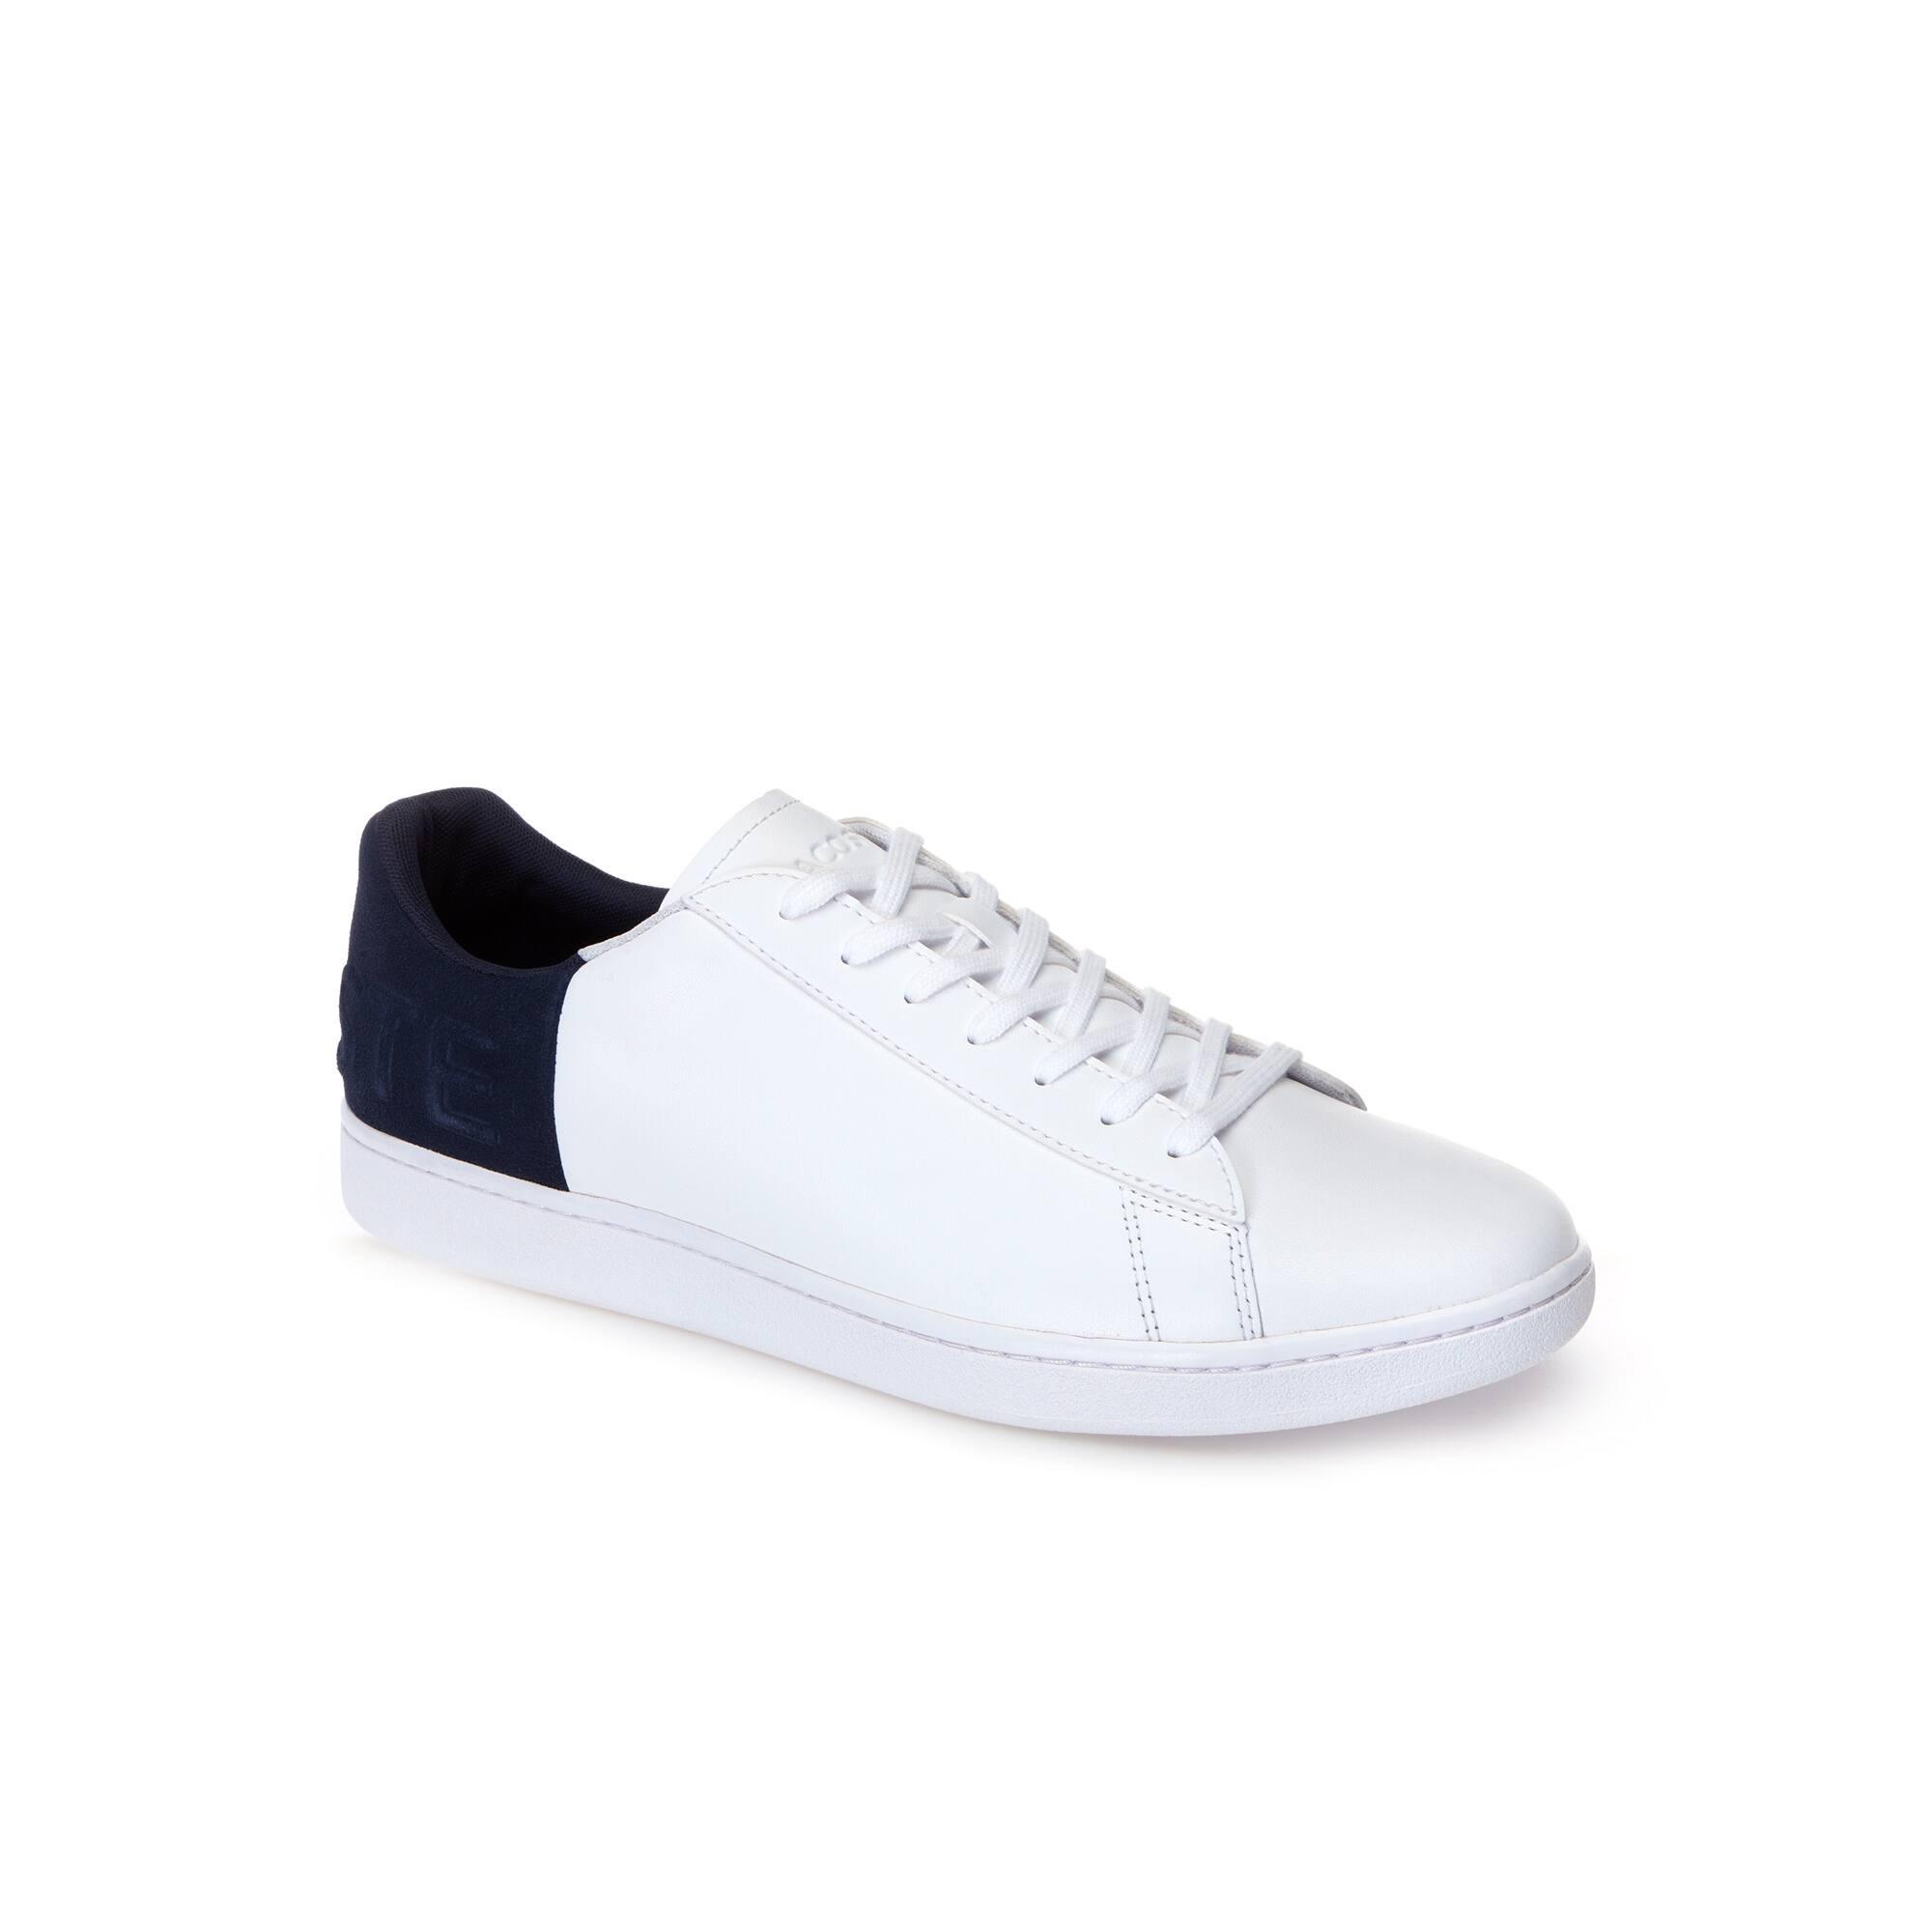 abc489d5542 Sneakers Carnaby Evo homme en cuir et suède ...